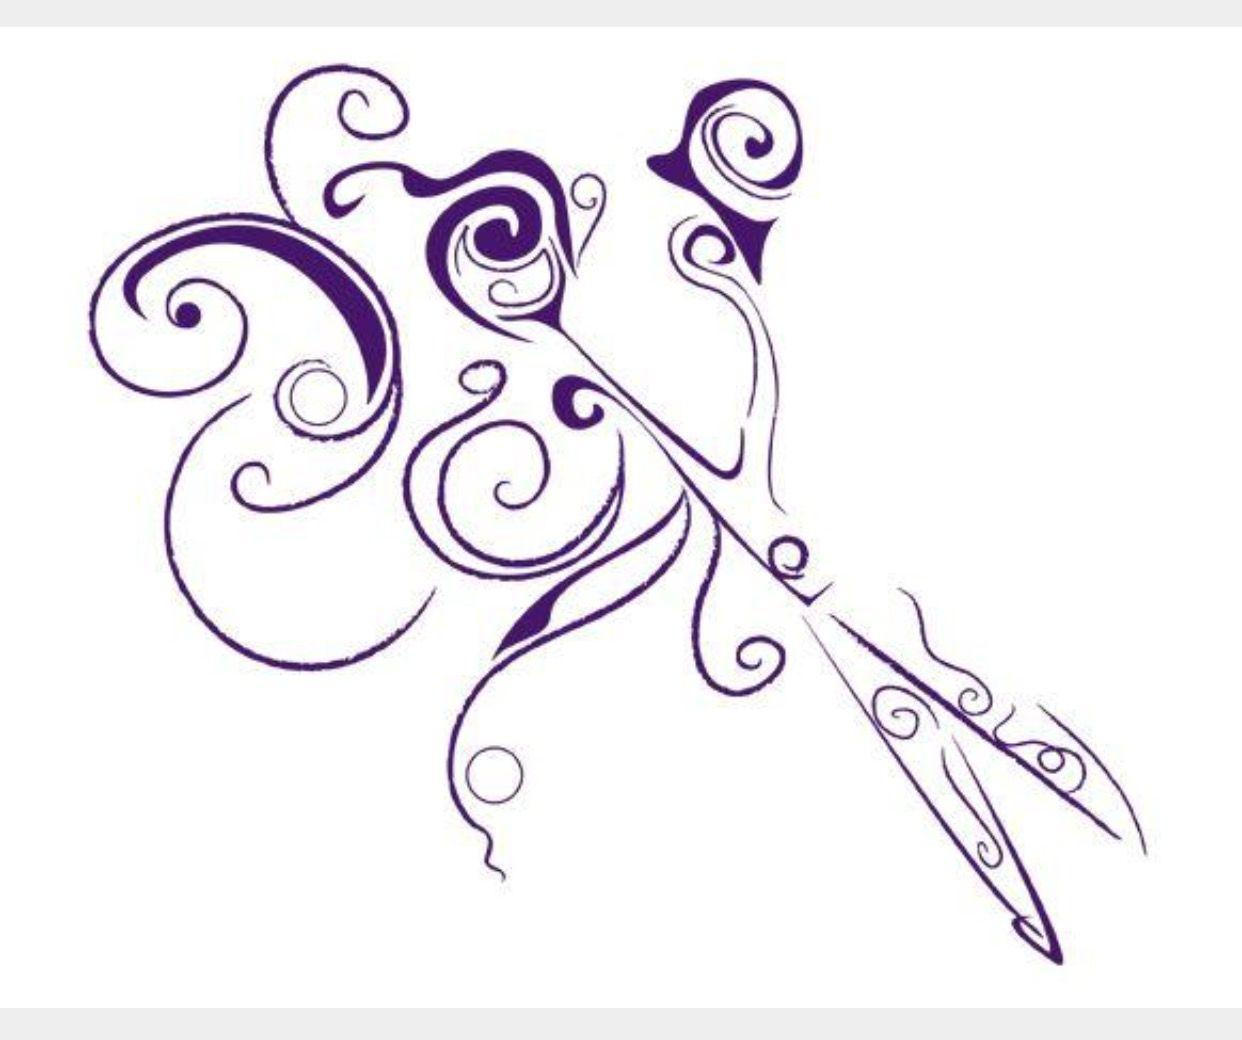 Pin By Joey Bennett On Hair By Purplejojo Pinterest Tattoo Tatting And Tatoo